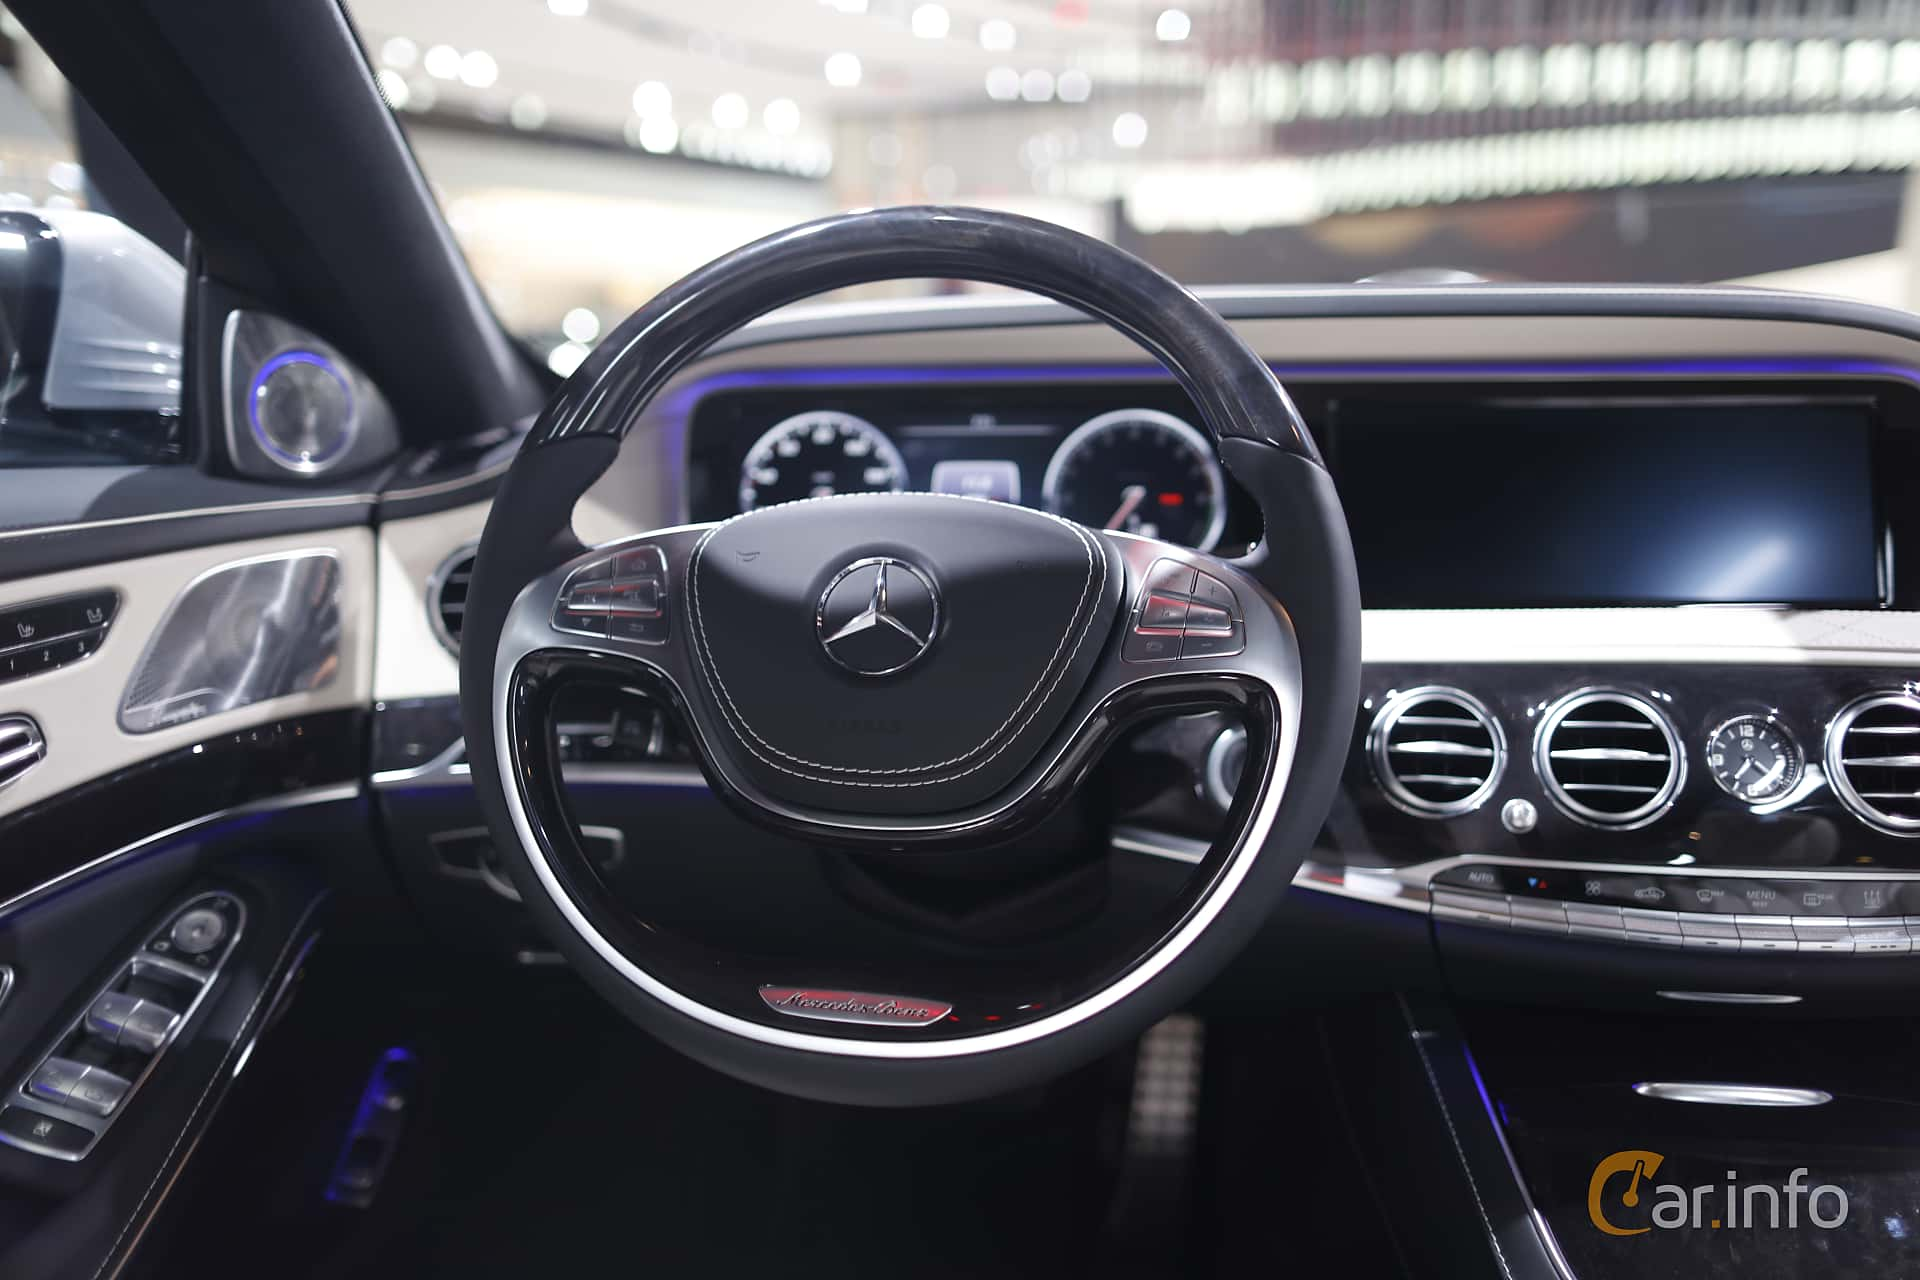 Mercedes-Benz S 500 e L 3.0 V6 7G-Tronic Plus, 442hp, 2017 at North American International Auto Show 2017